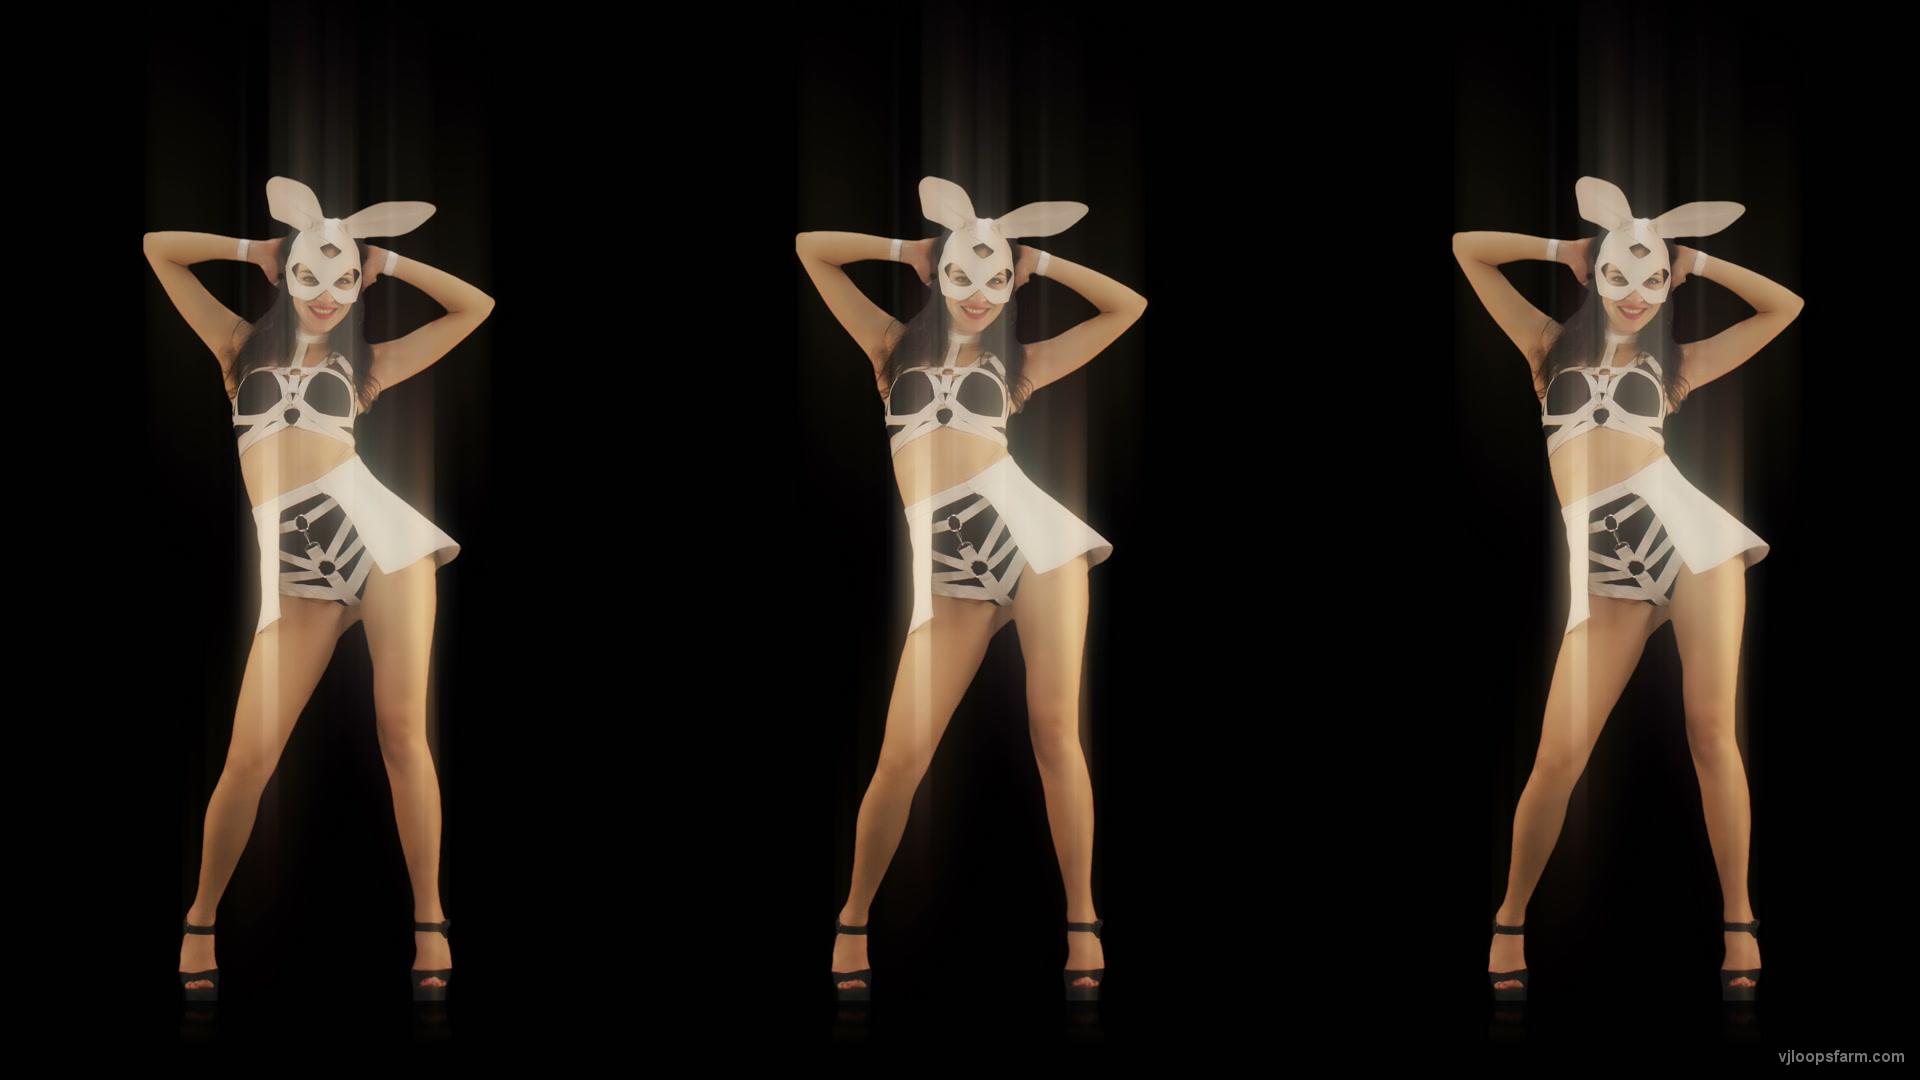 vj video background Trio-Dance-Shake-Twerk-Bunny-Rabbit-Girl-Video-Art-4K-Vj-Loop_003